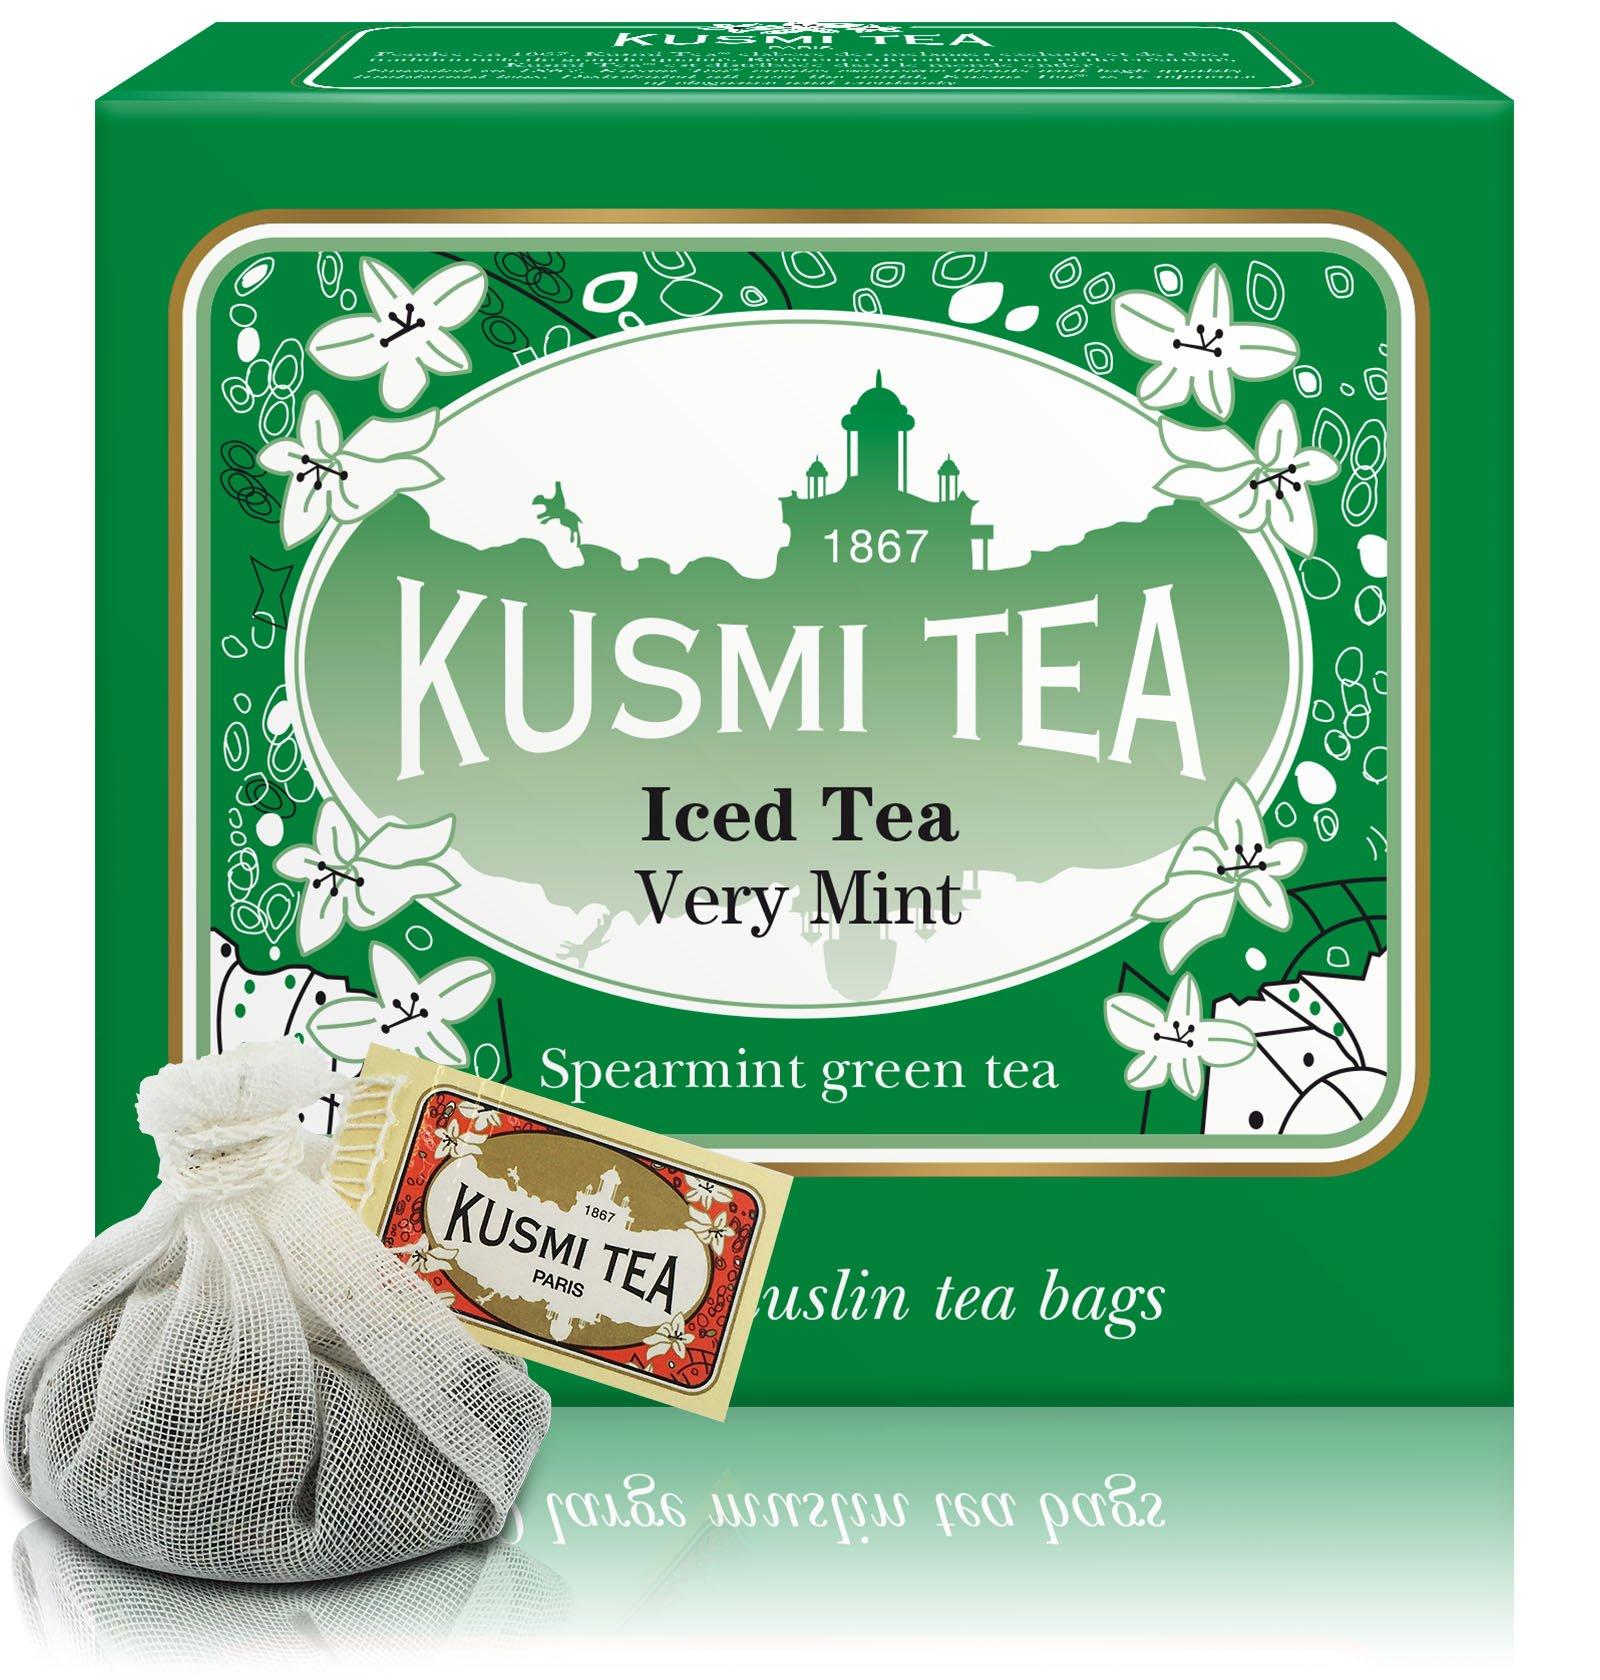 Kusmi Tea - Spearmint Green Tea - Refreshing Green Tea with Spearmint Leaves & Mint Essential Oils - All Natural, Premium Loose Leaf Spearmint Green Tea in 10 Large Eco-Friendly Tea Bags (1 Liter/Bag)